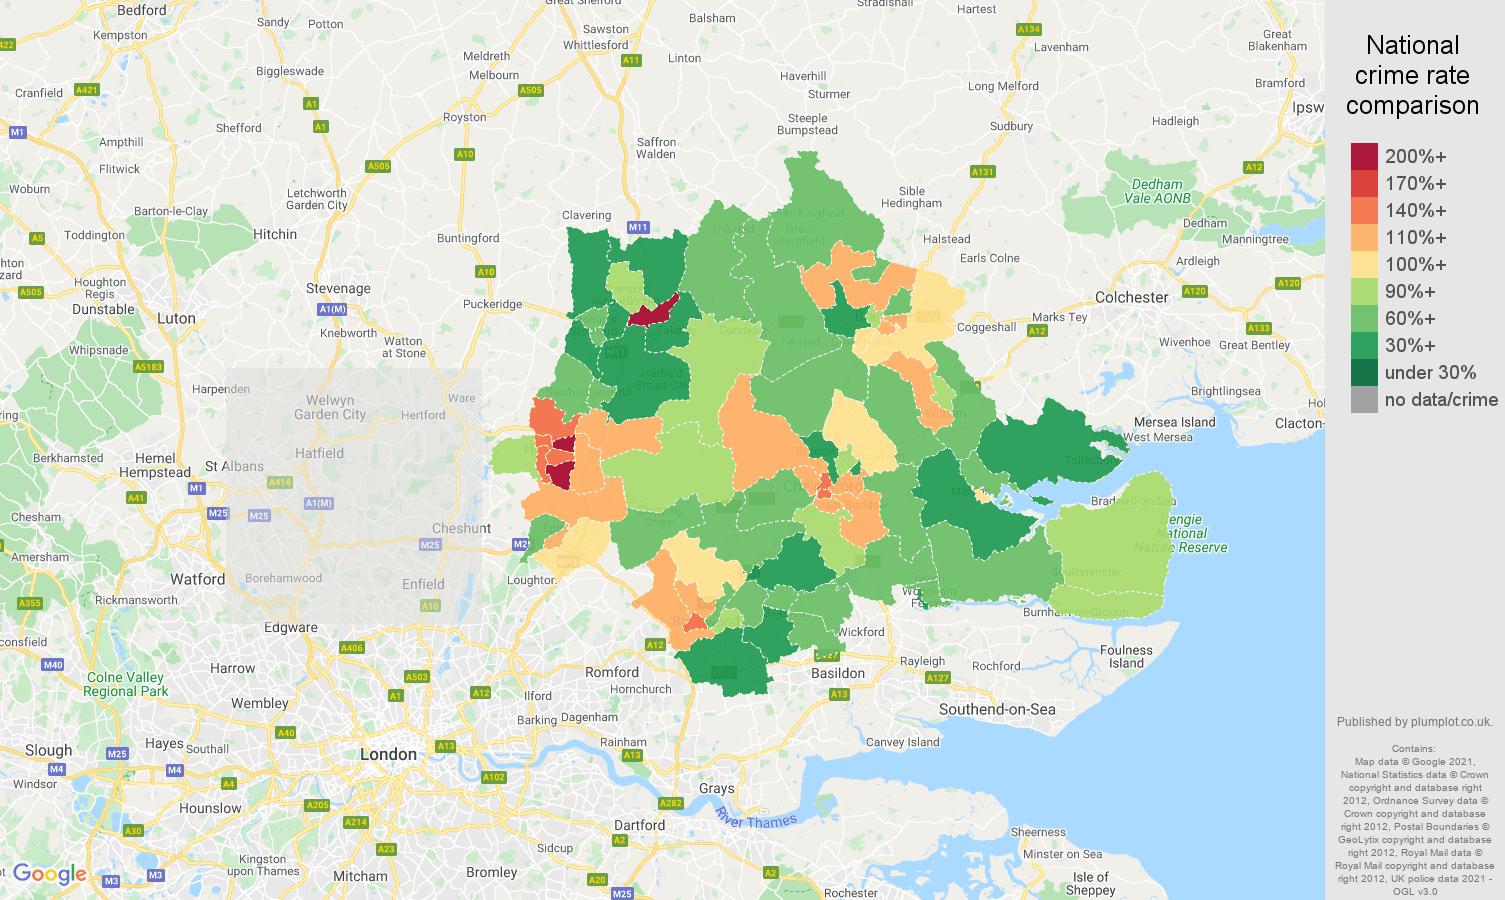 Chelmsford antisocial behaviour crime rate comparison map